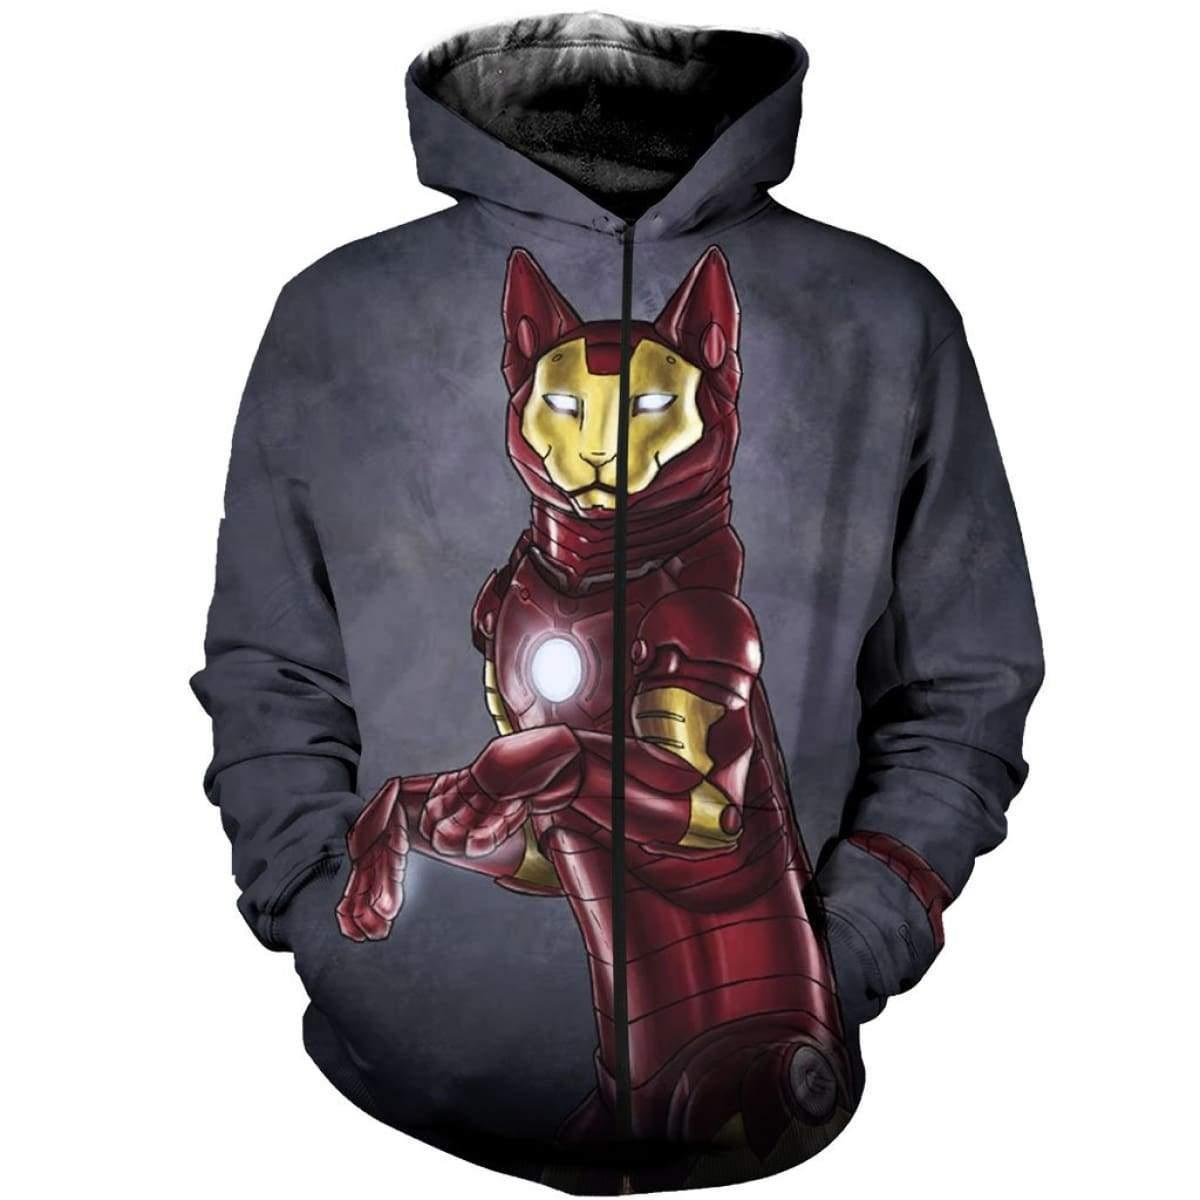 Avengers iron man iron cat all over print zip hoodie